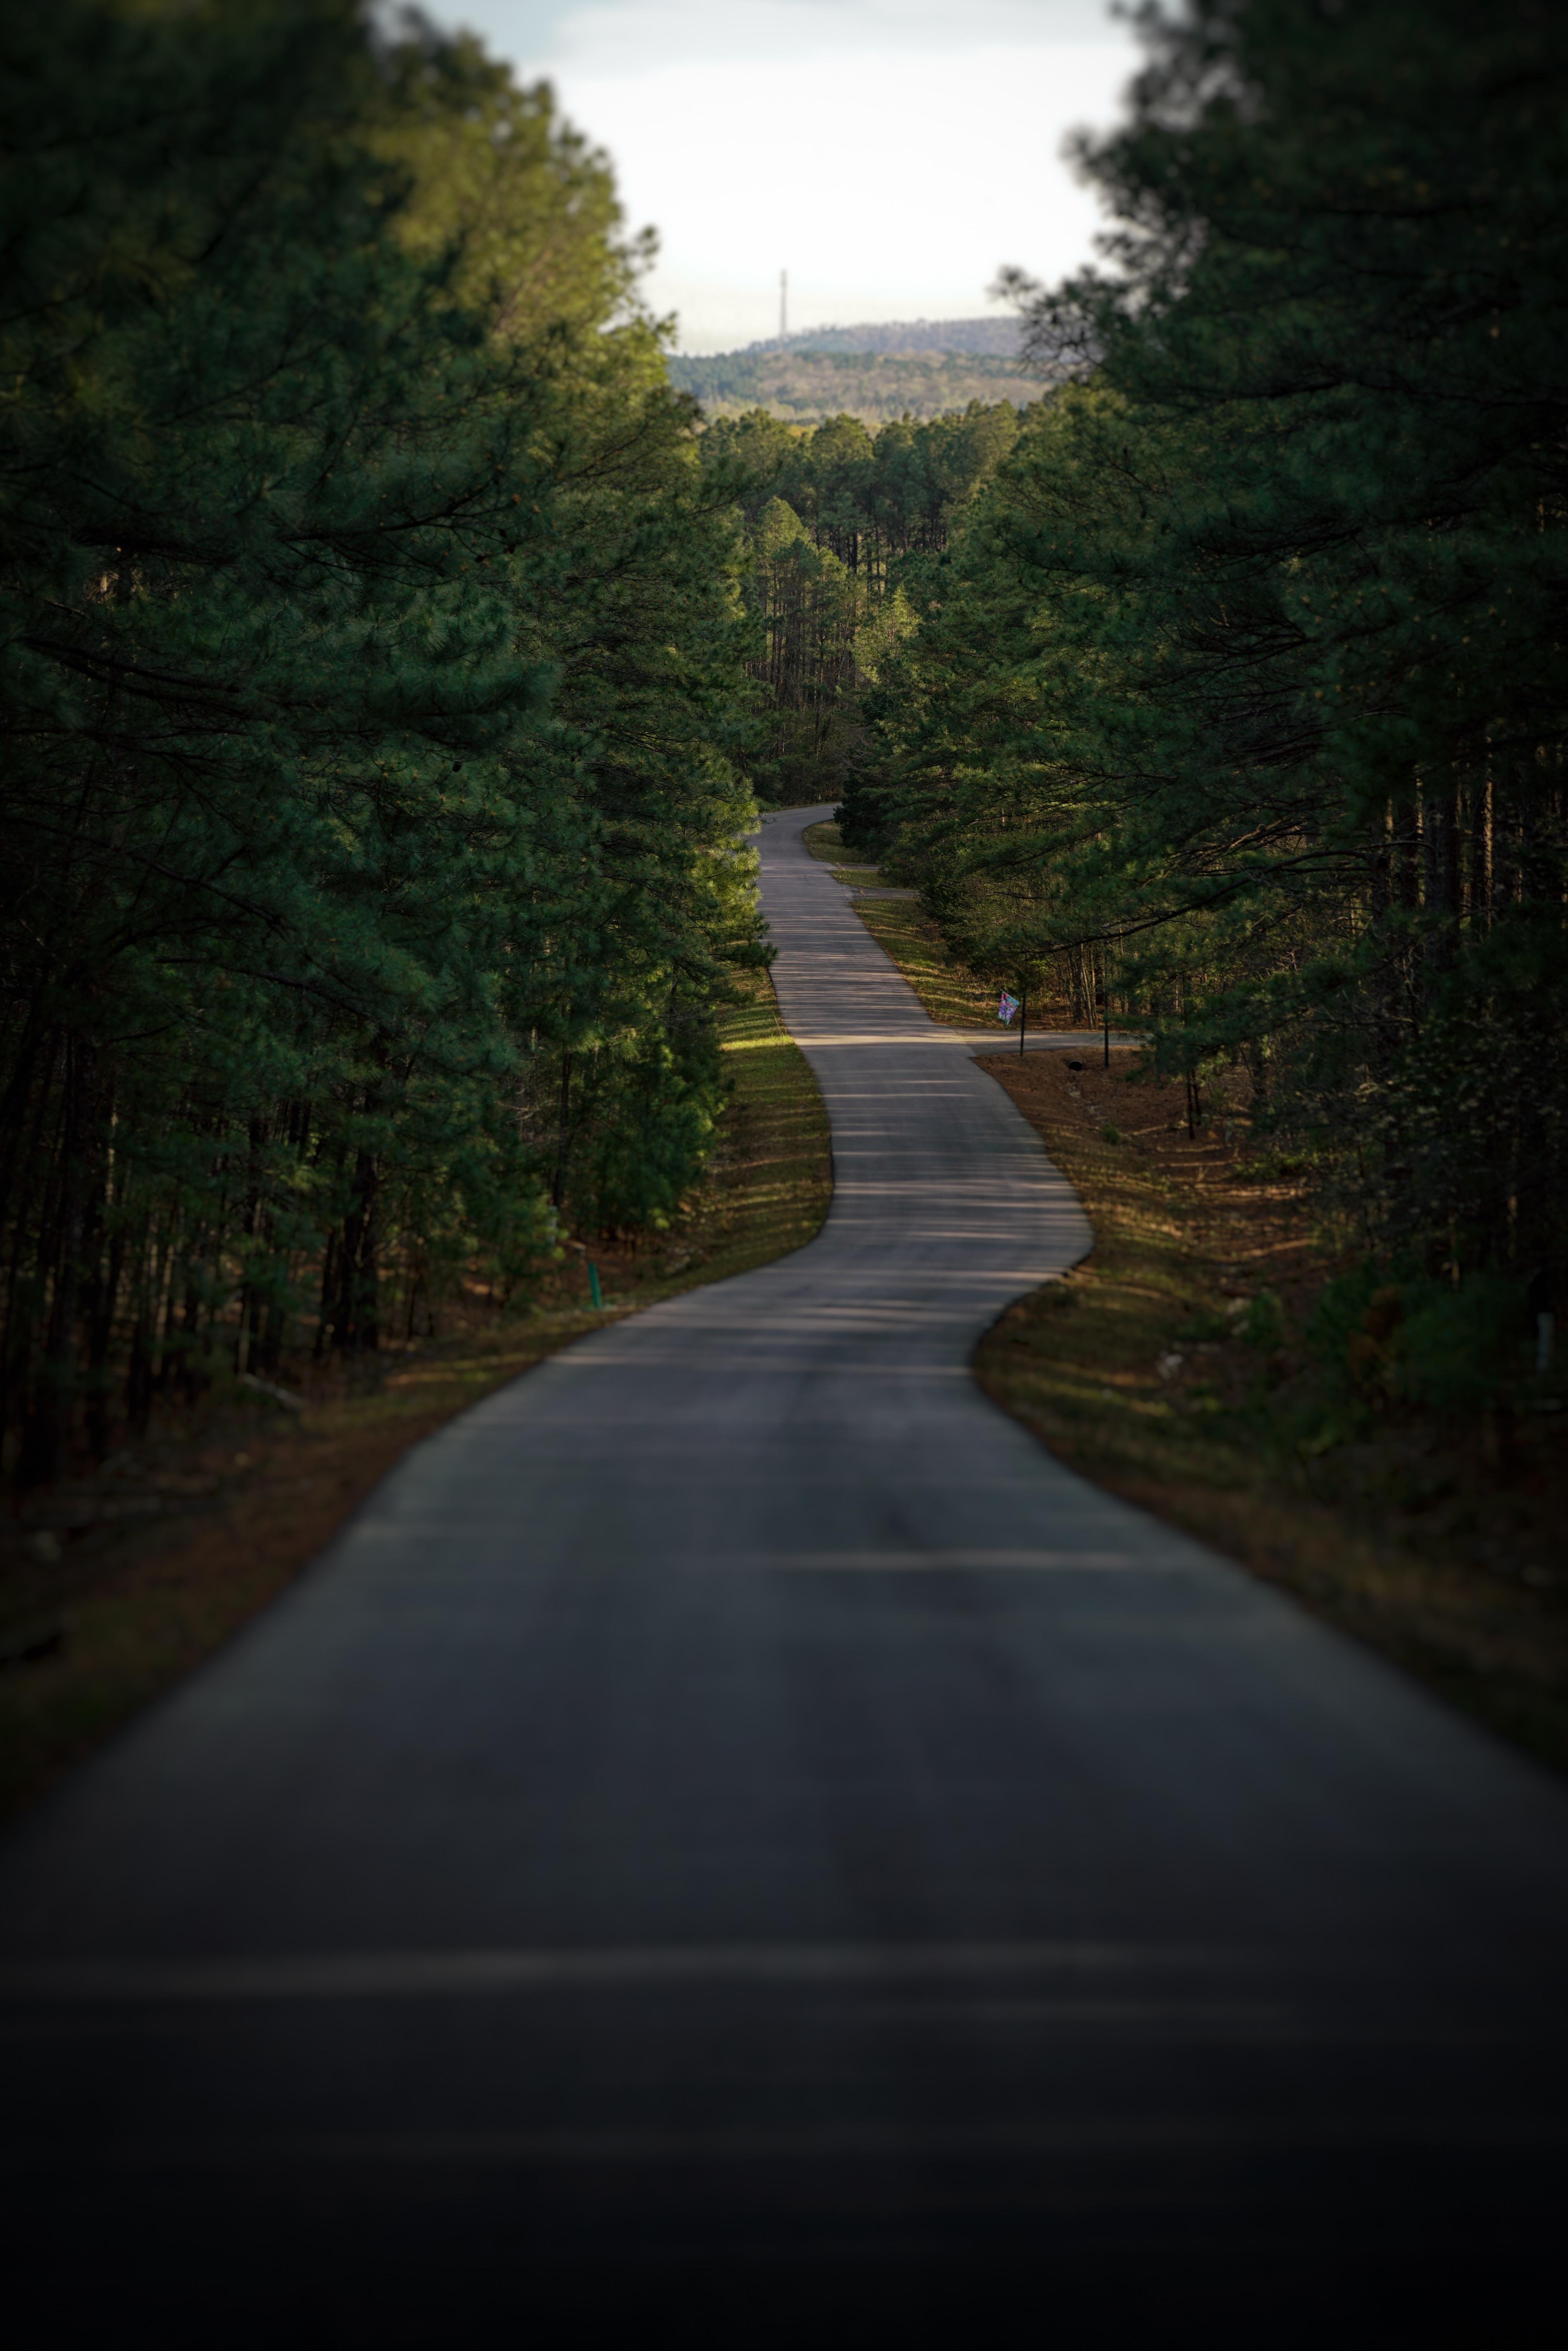 grey asphalt road between trees during daytime